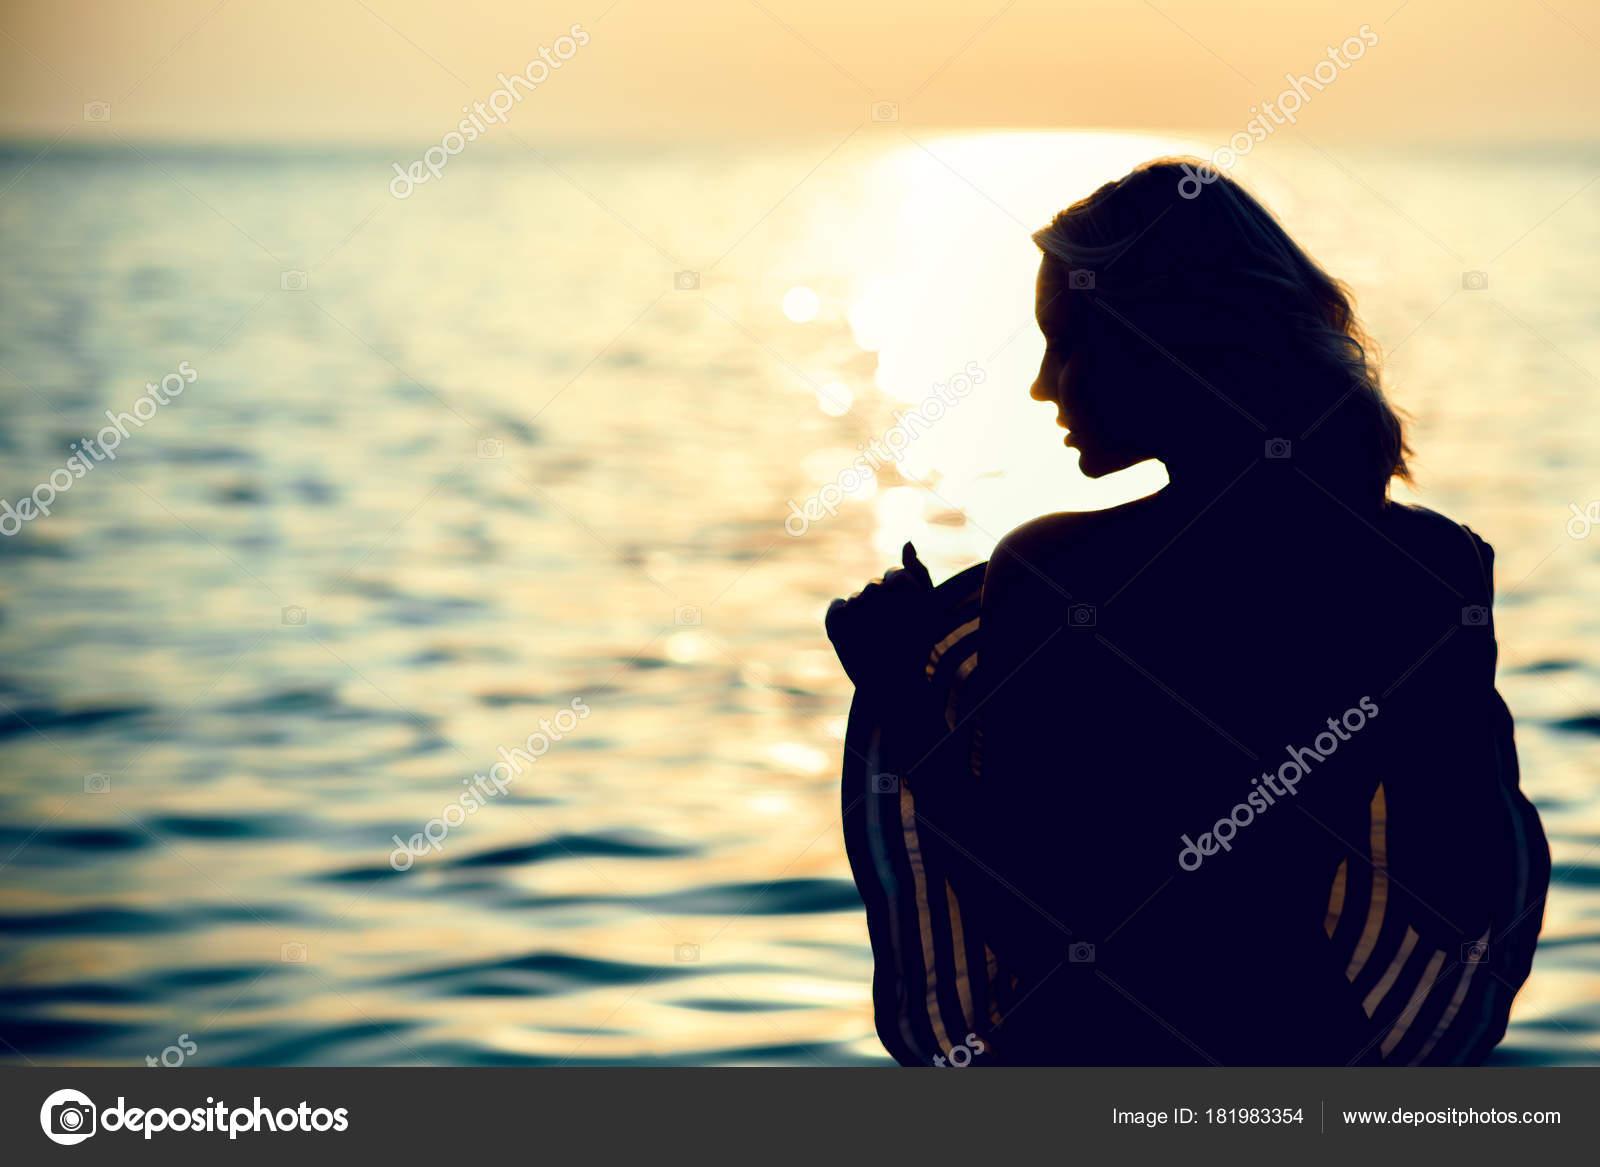 cc3d36f7c4b Σιλουέτα του μια όμορφη γυναίκα που στέκεται με την πλάτη στην ...